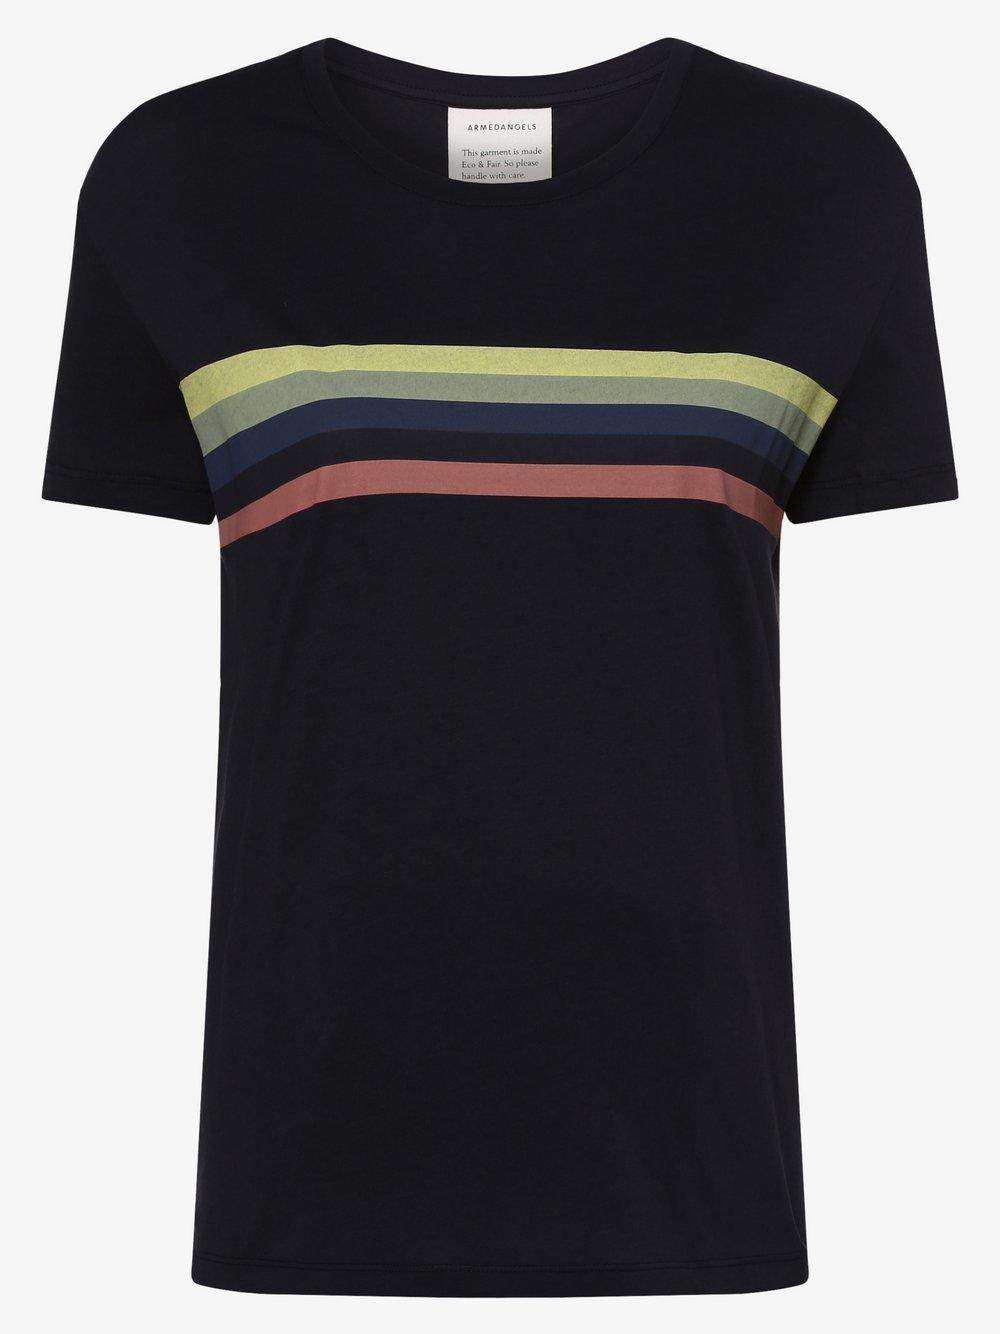 ARMEDANGELS - T-shirt damski – Nelaa, niebieski